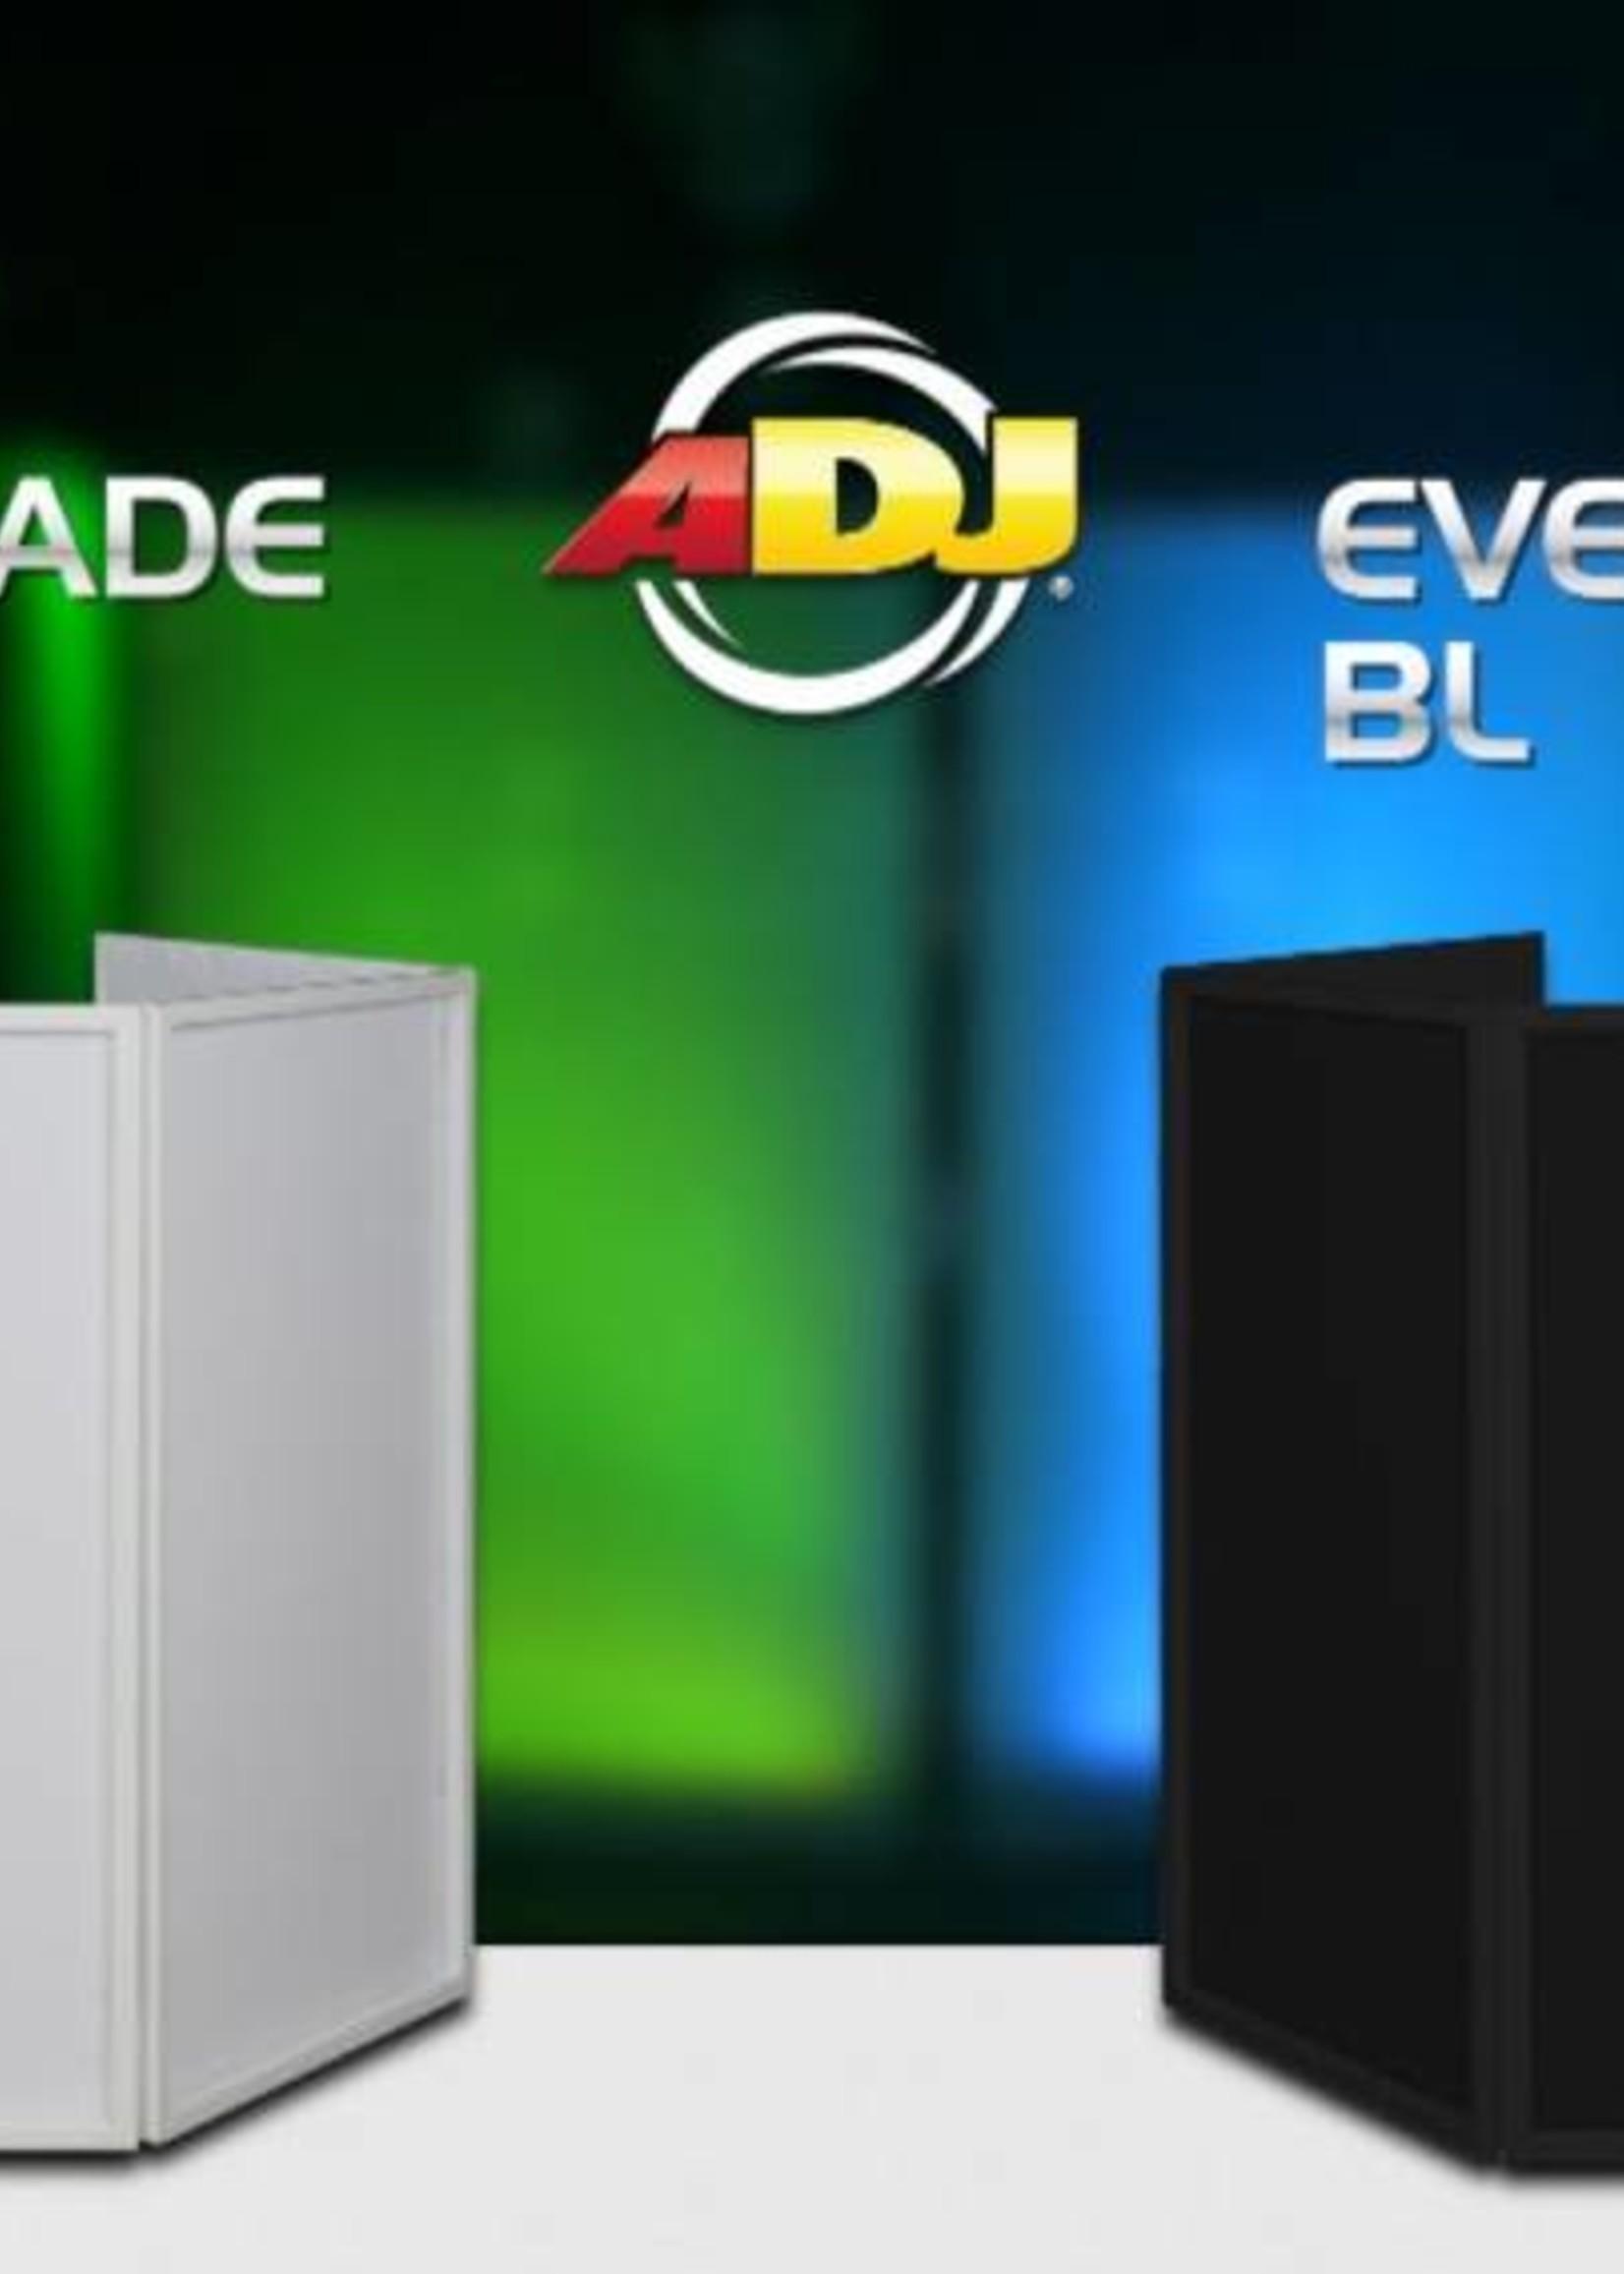 AMERICAN DJ EVENT FACADE BL ADJ